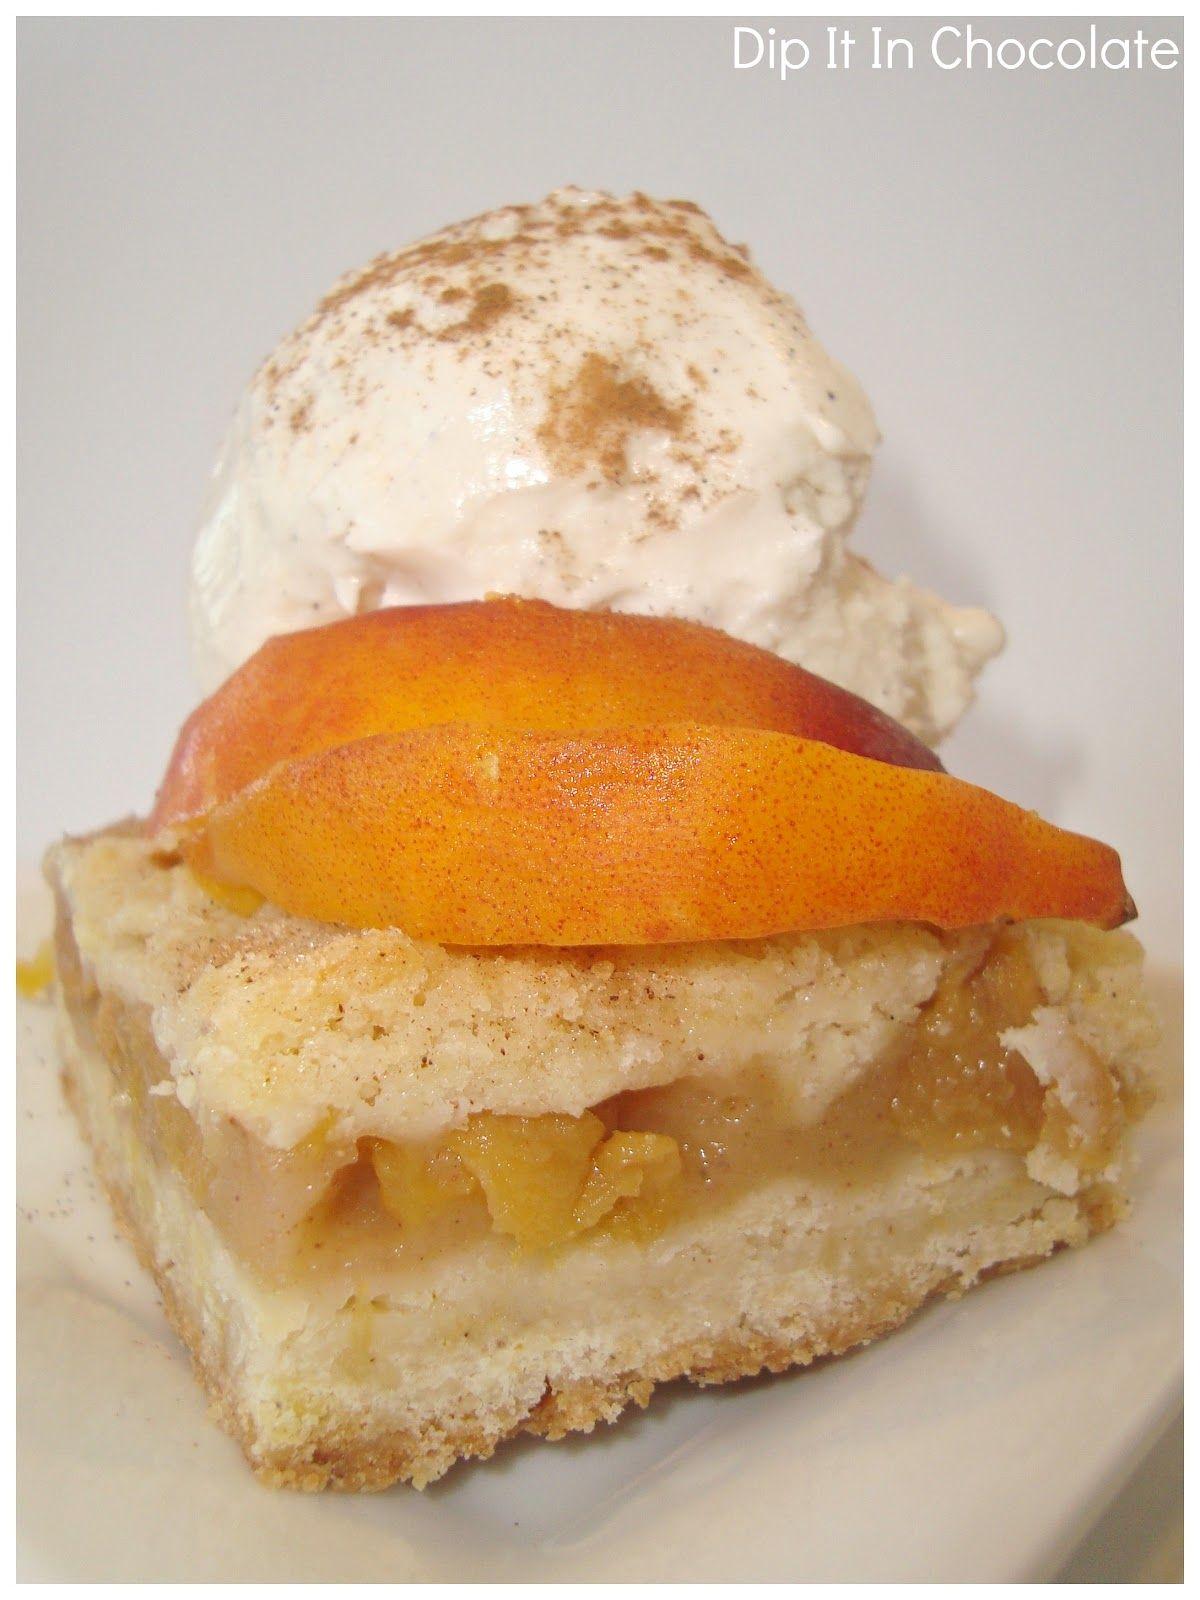 Dip it in Chocolate: Peach Crumb Bars